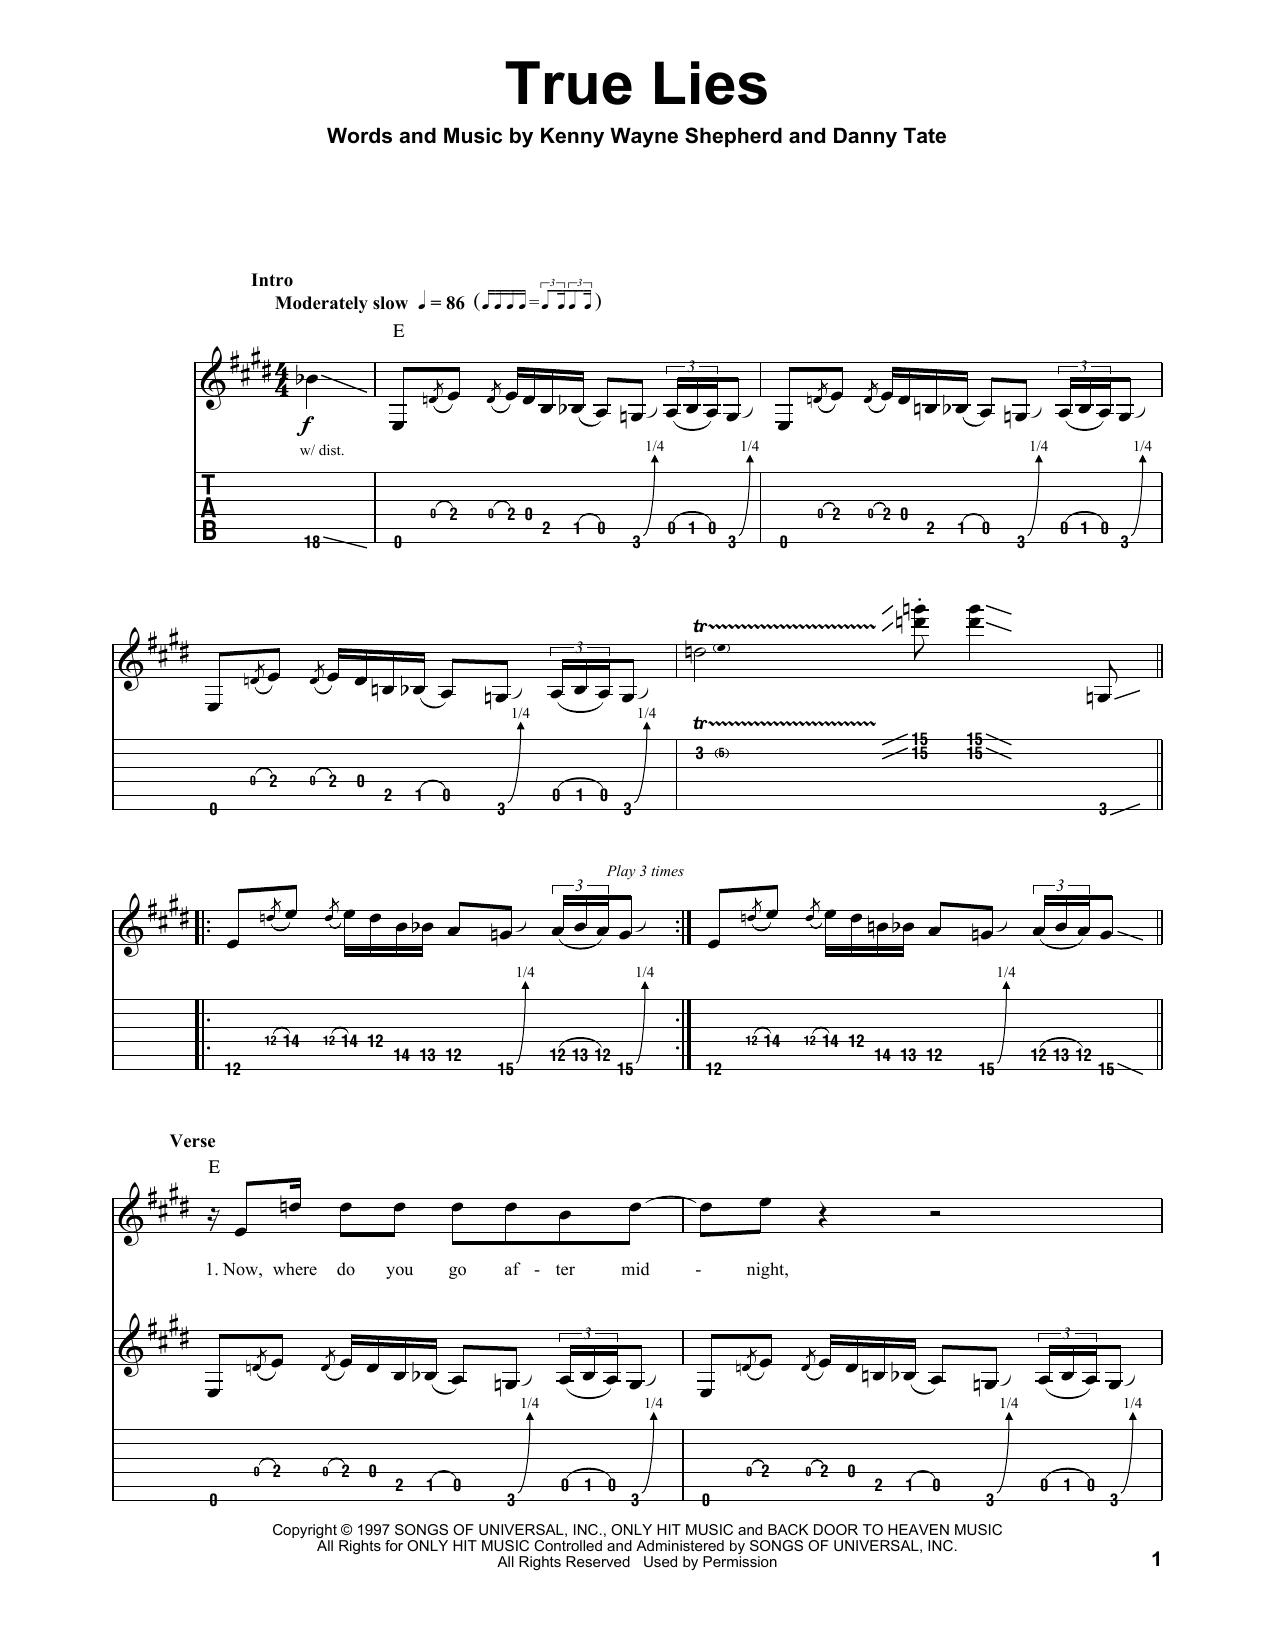 True lies sheet music by kenny wayne shepherd guitar tab play kenny wayne shepherd true lies guitar tab play along hexwebz Image collections